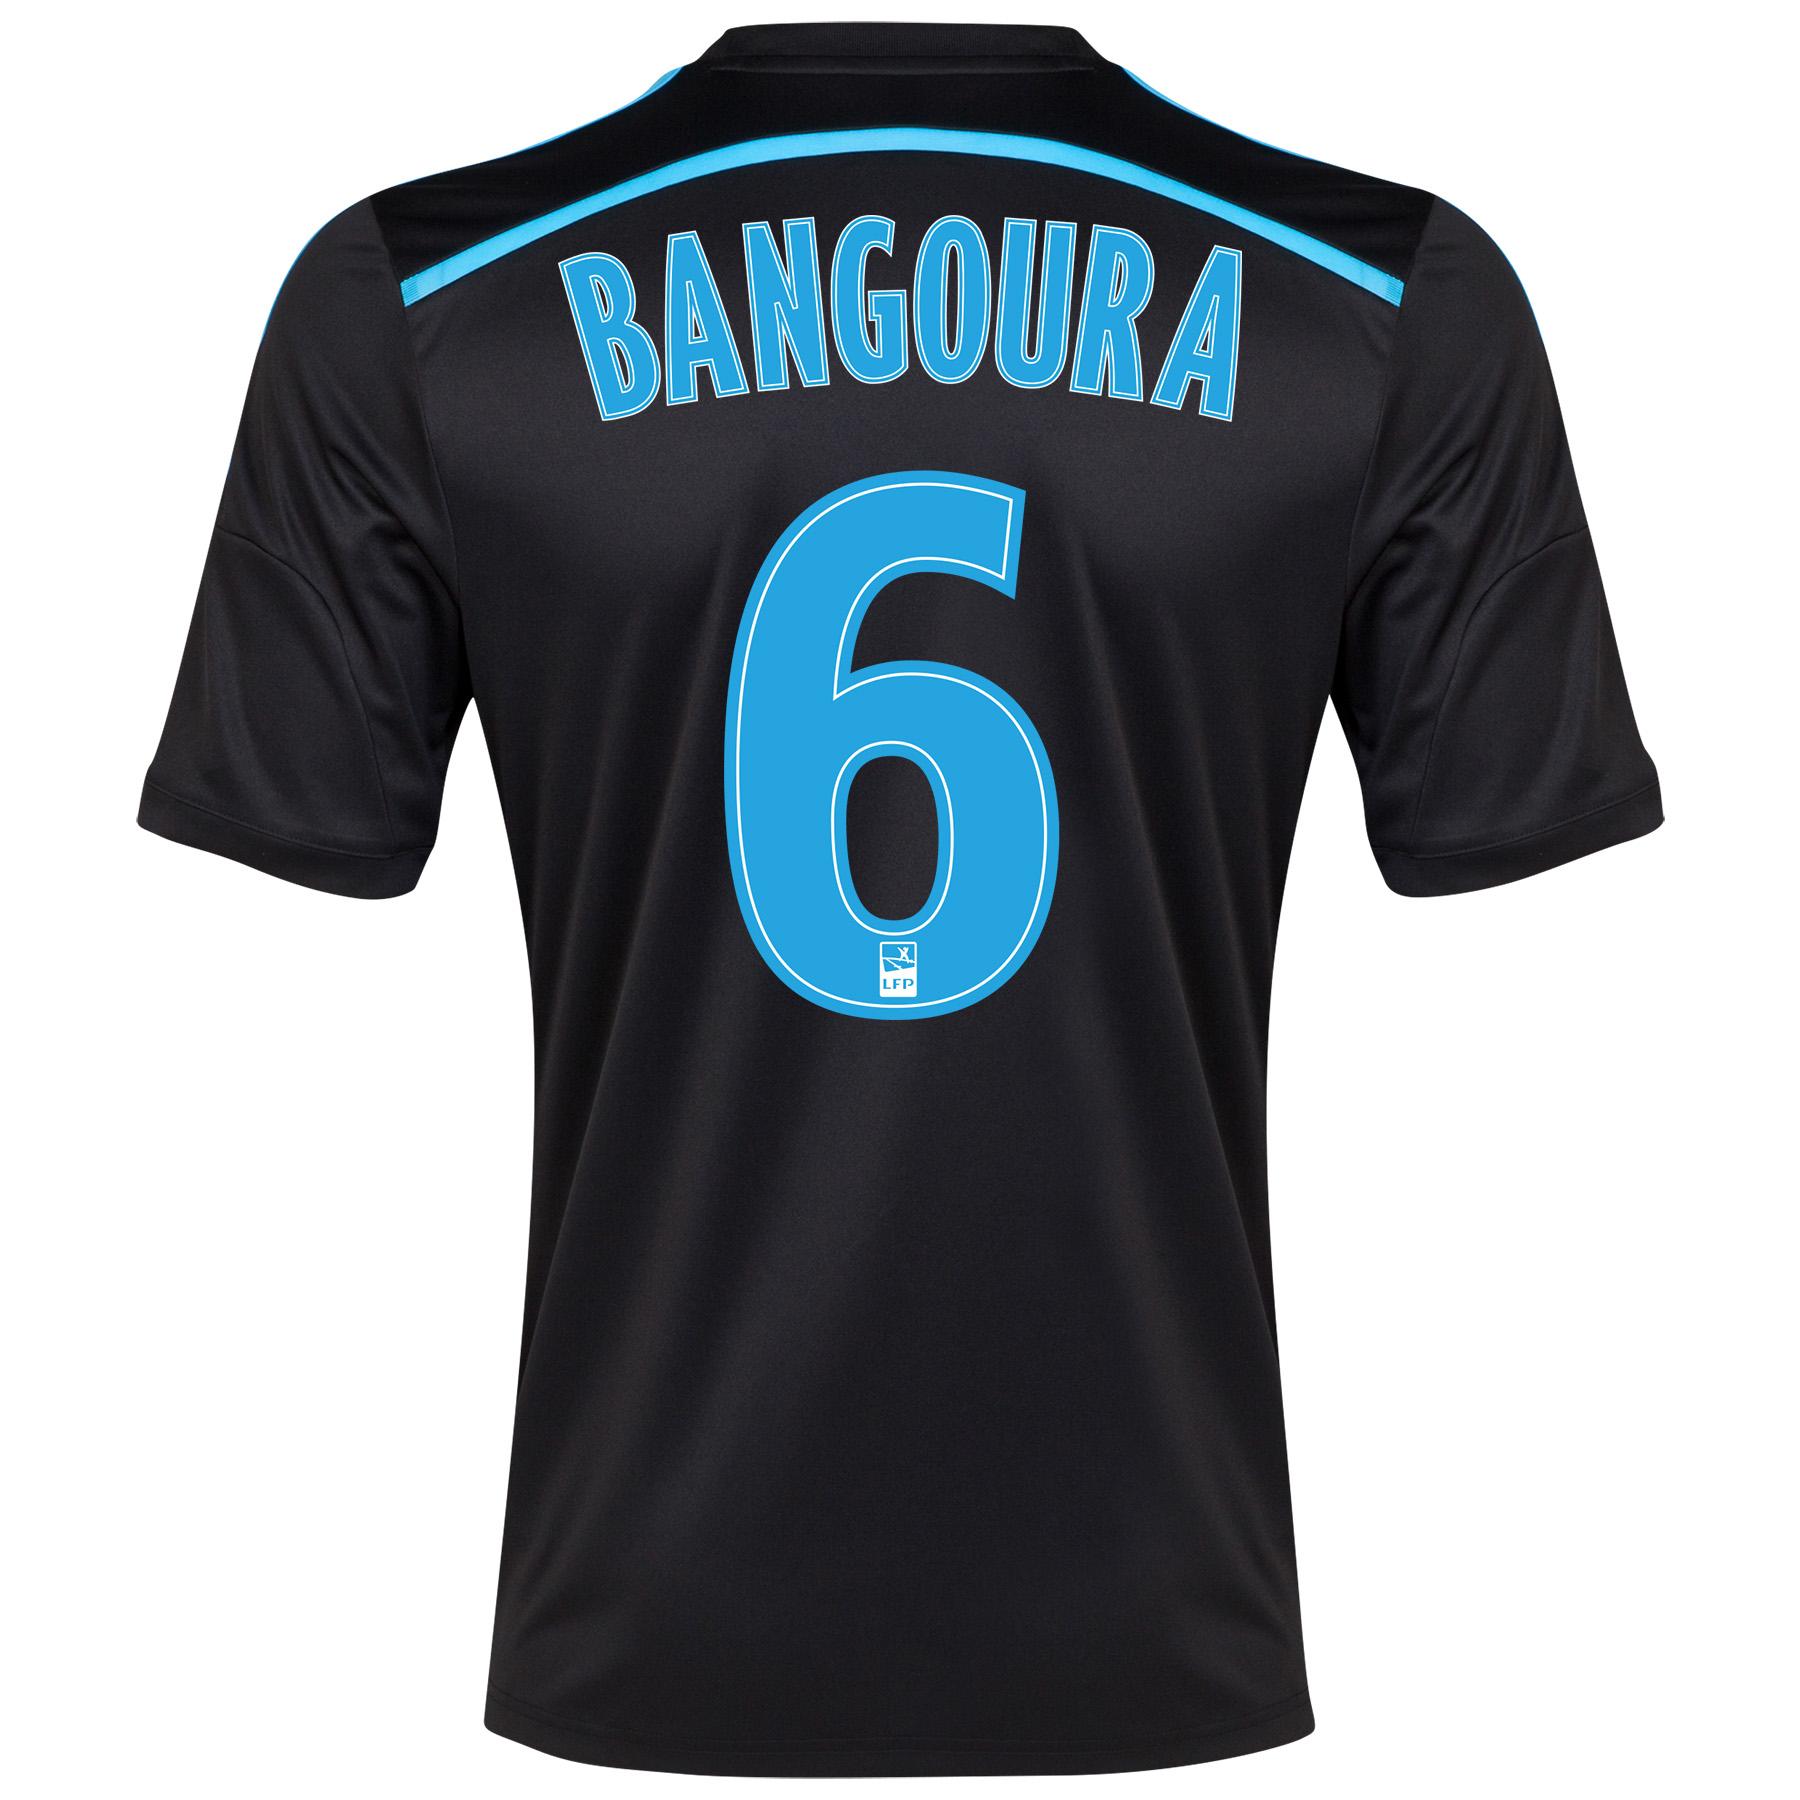 Olympique de Marseille 3rd Shirt Short Sleeve - Junior 2014/15 Black with Bangoura 6 printing